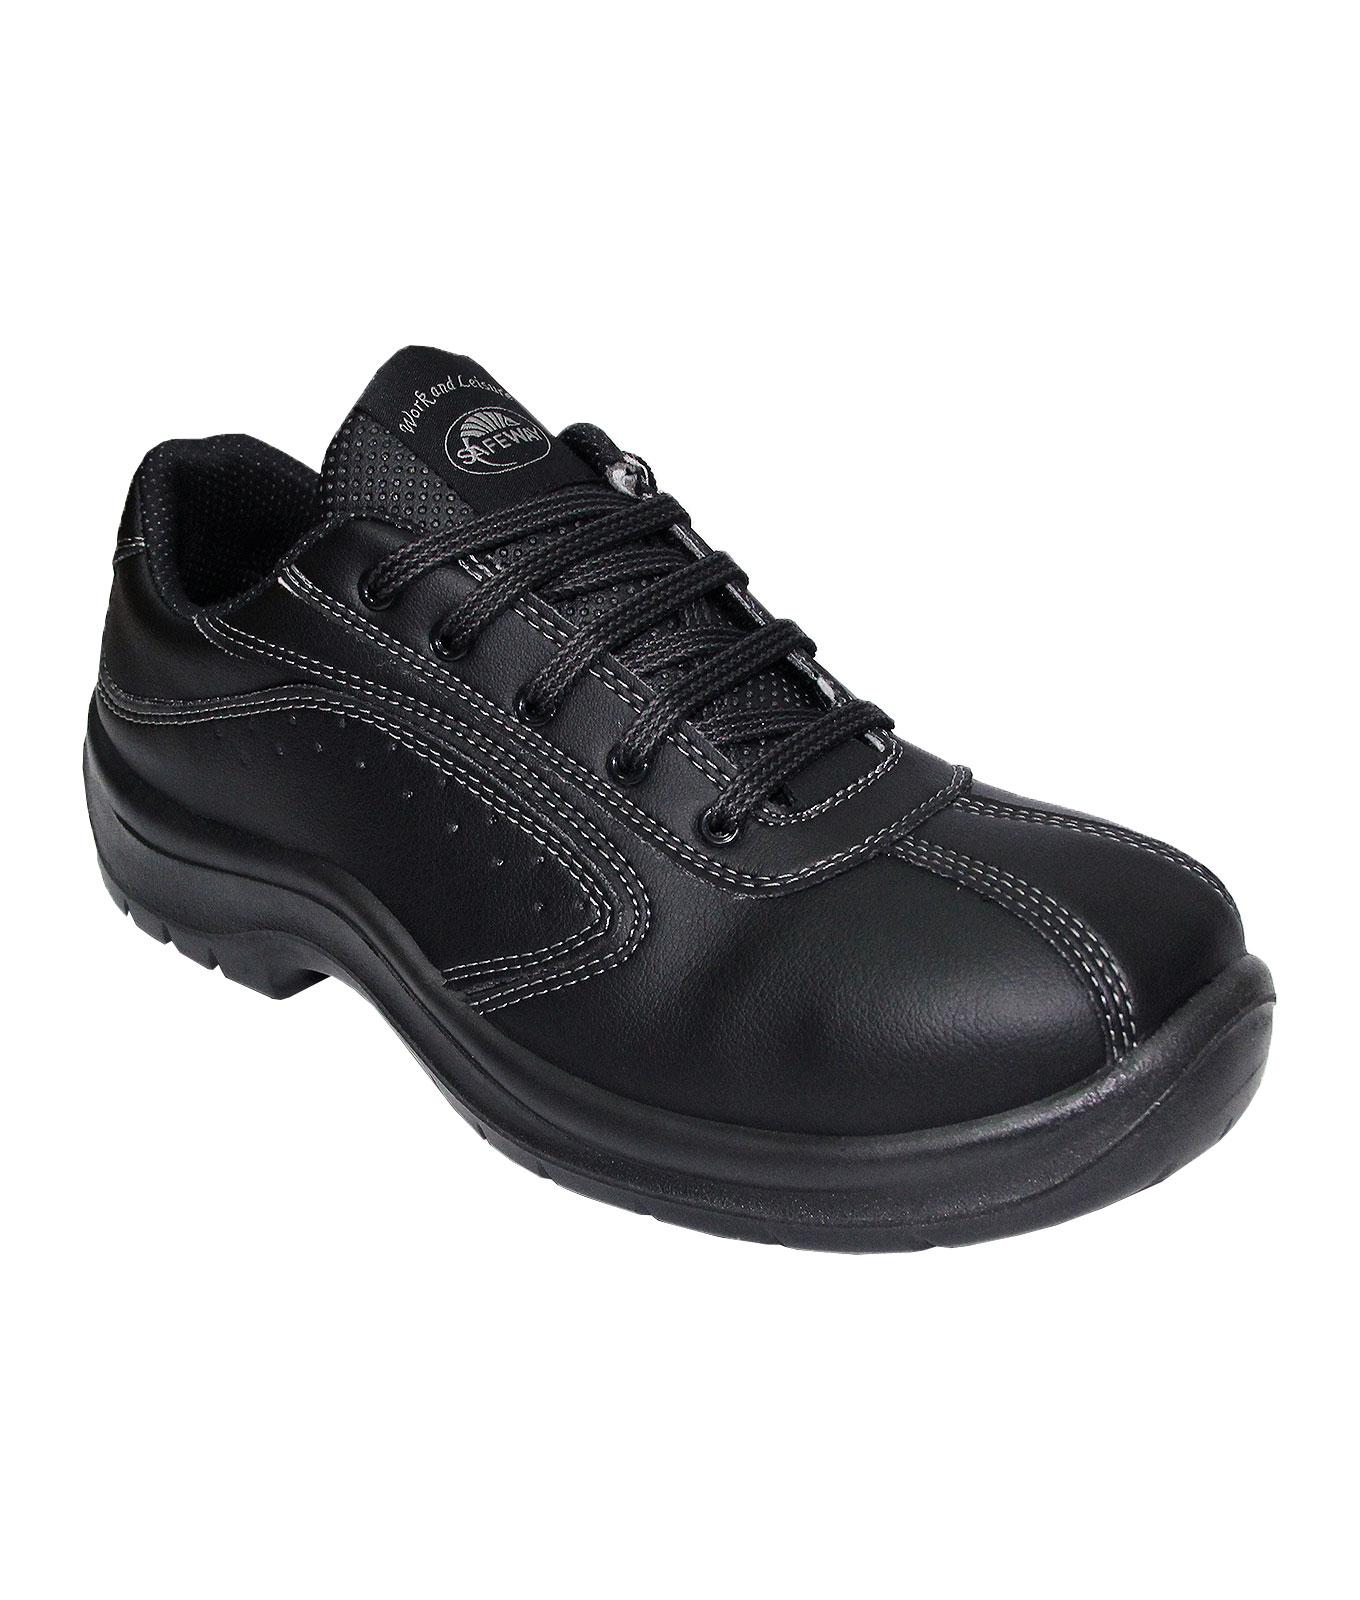 Derby: Εξαιρετικά ελαφριά παπούτσια εργασίας 1